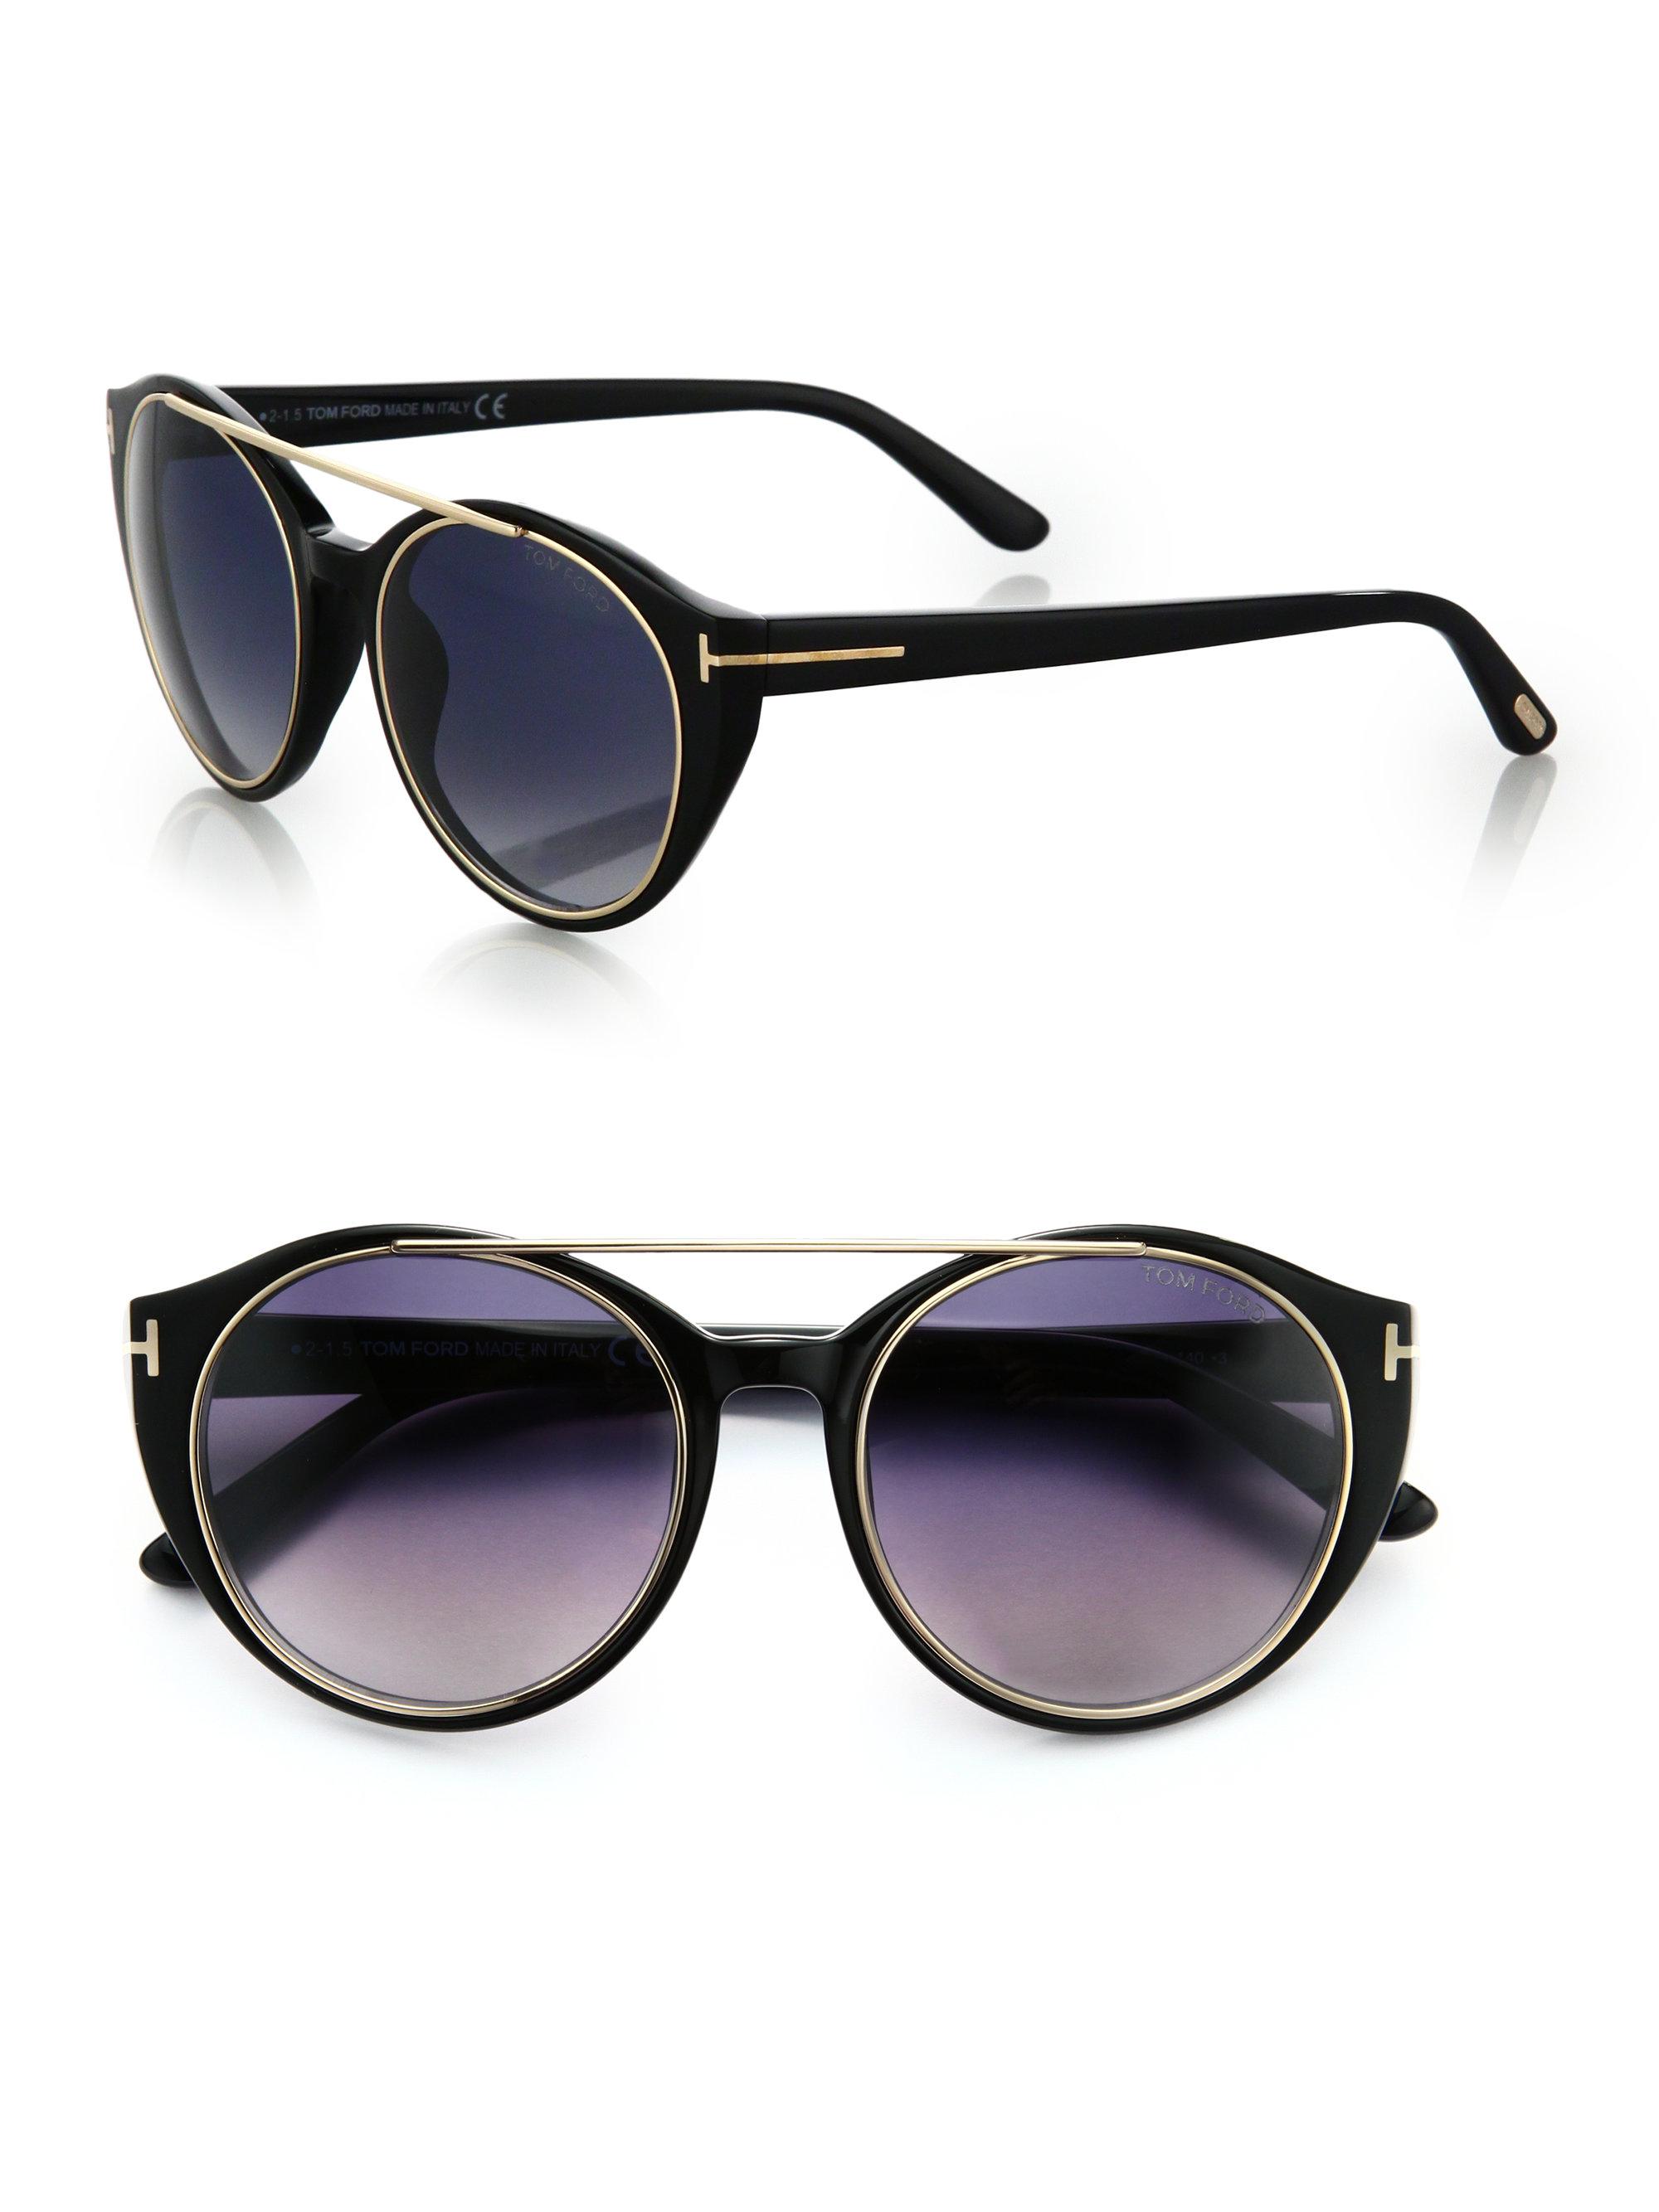 3846d91ff58 Tom Ford Emma Black CatEye Sunglasses as seen on Meghan